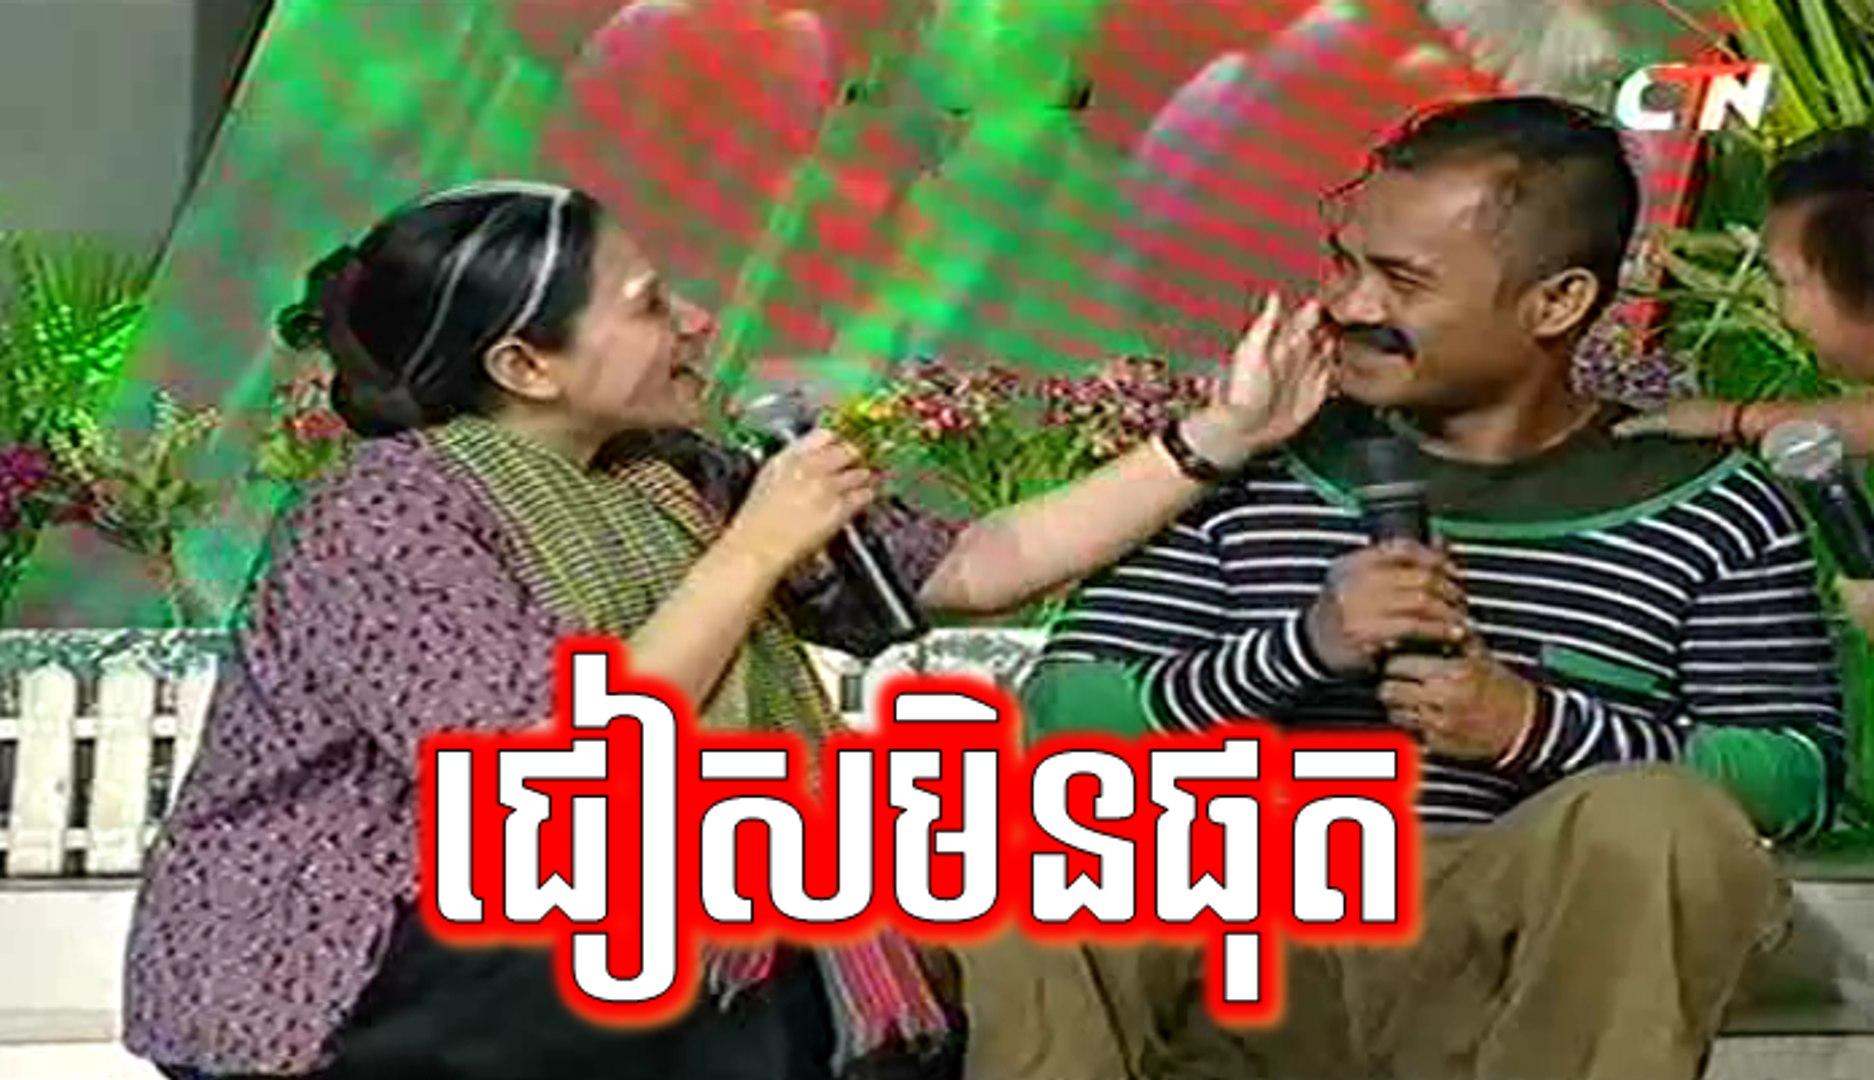 Khmer Comedy, ជៀសមិនផុត, Cheas Min Put, កំប្លែងនាយកុយ, Neay Koy Comedy, CTN Comedy